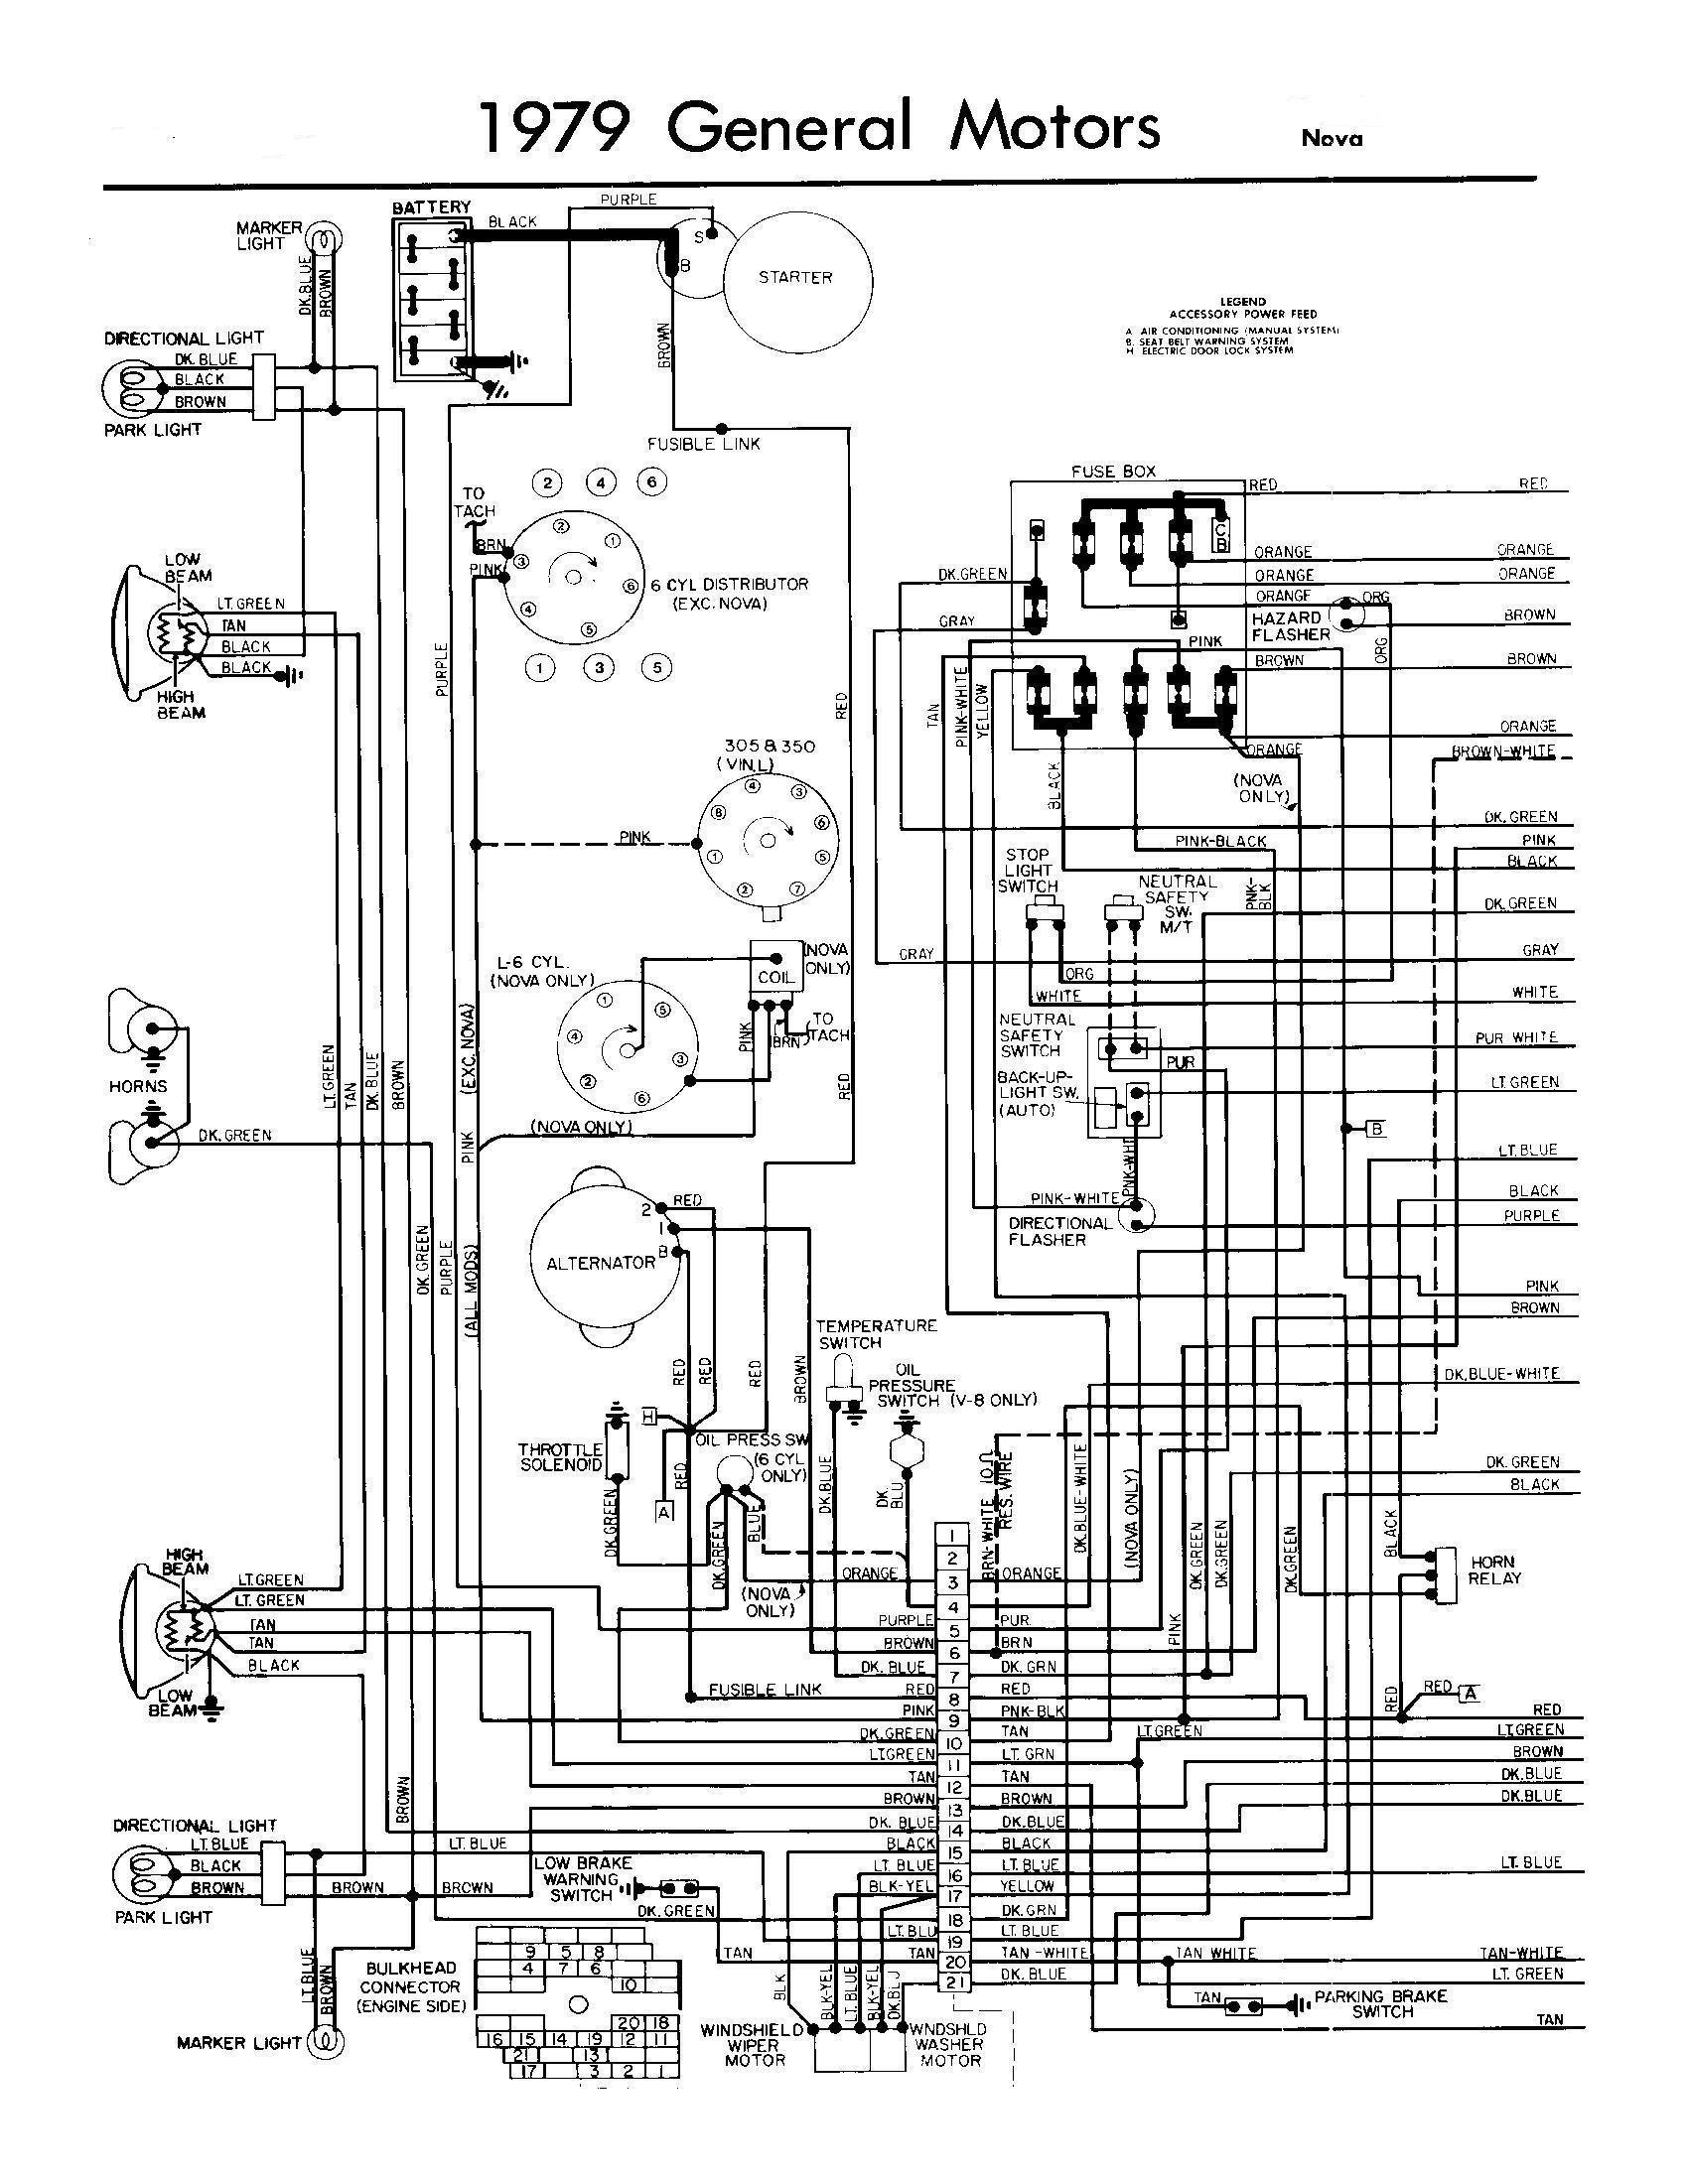 Car Ignition Diagram All Generation Wiring Schematics Chevy Nova forum Of Car Ignition Diagram